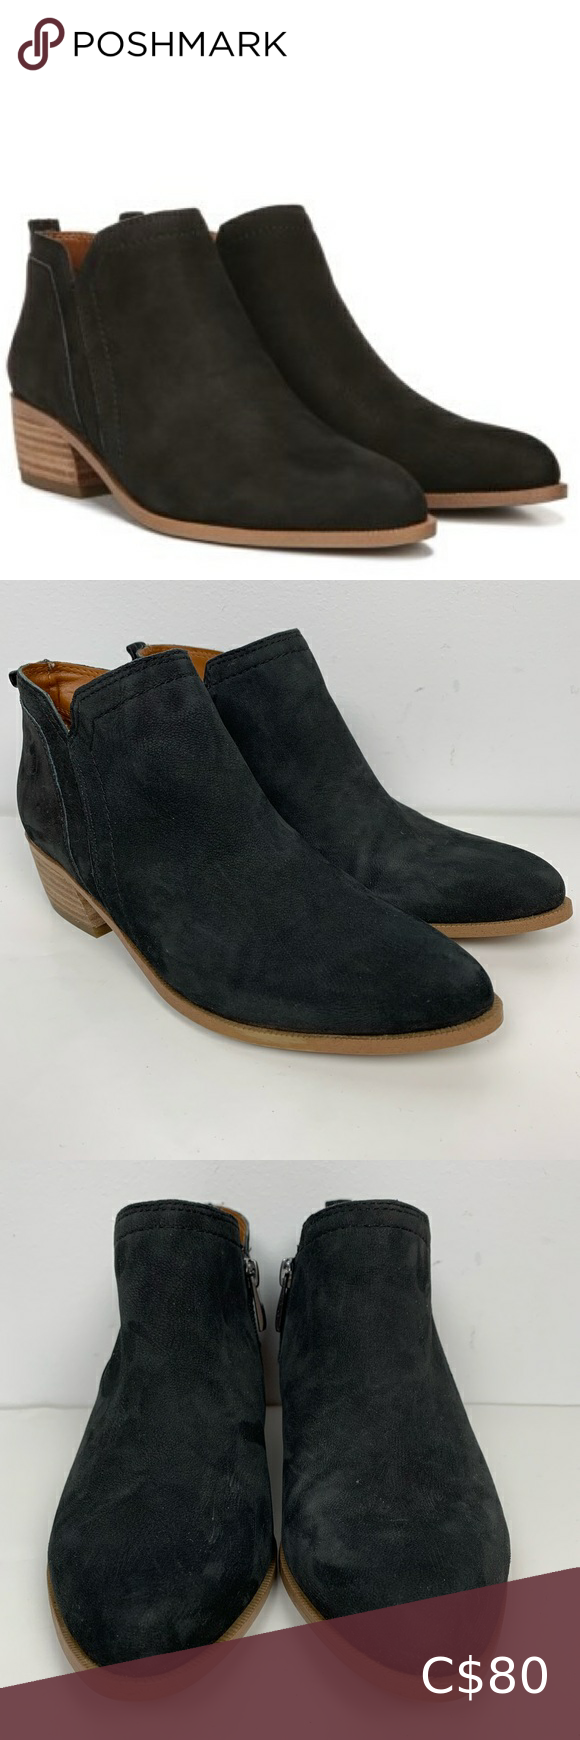 NWOT Franco Sarto Laslo Black Leather